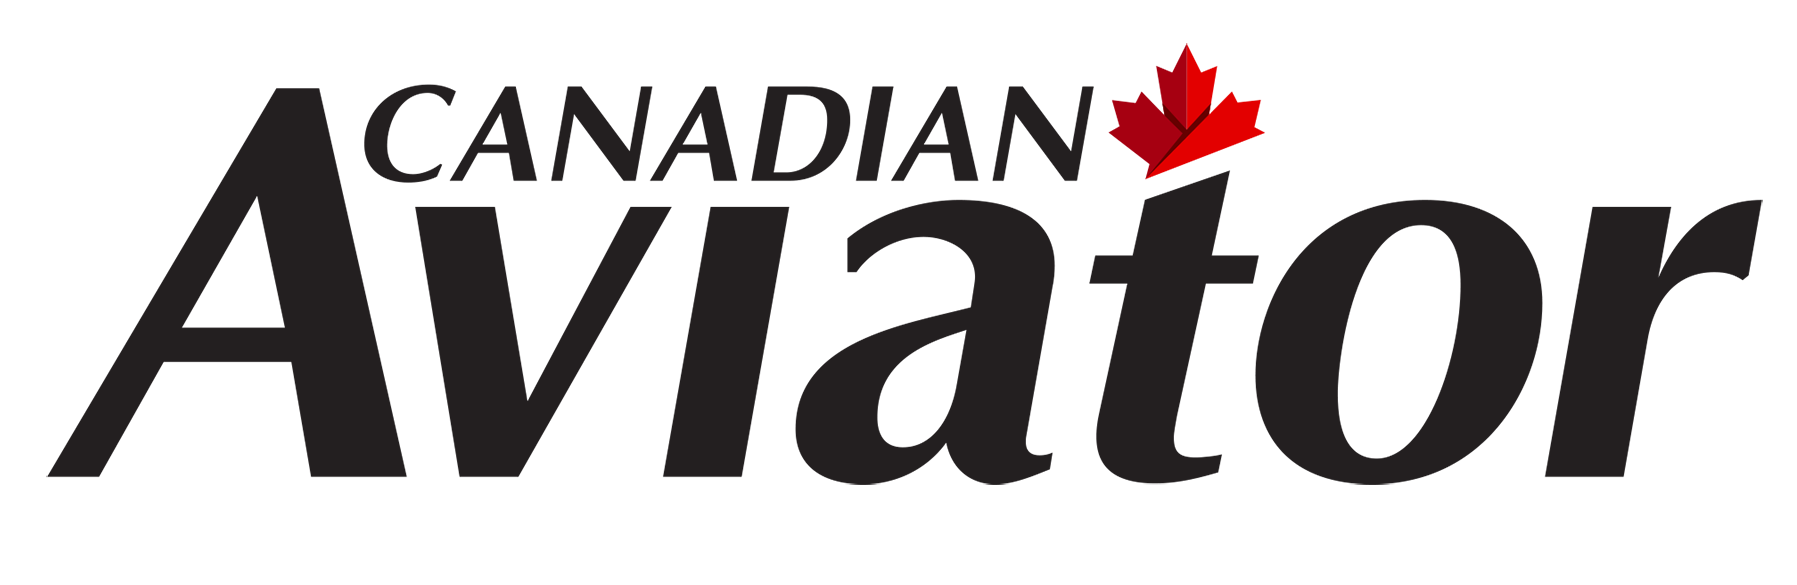 Canadian Aviator Magazine